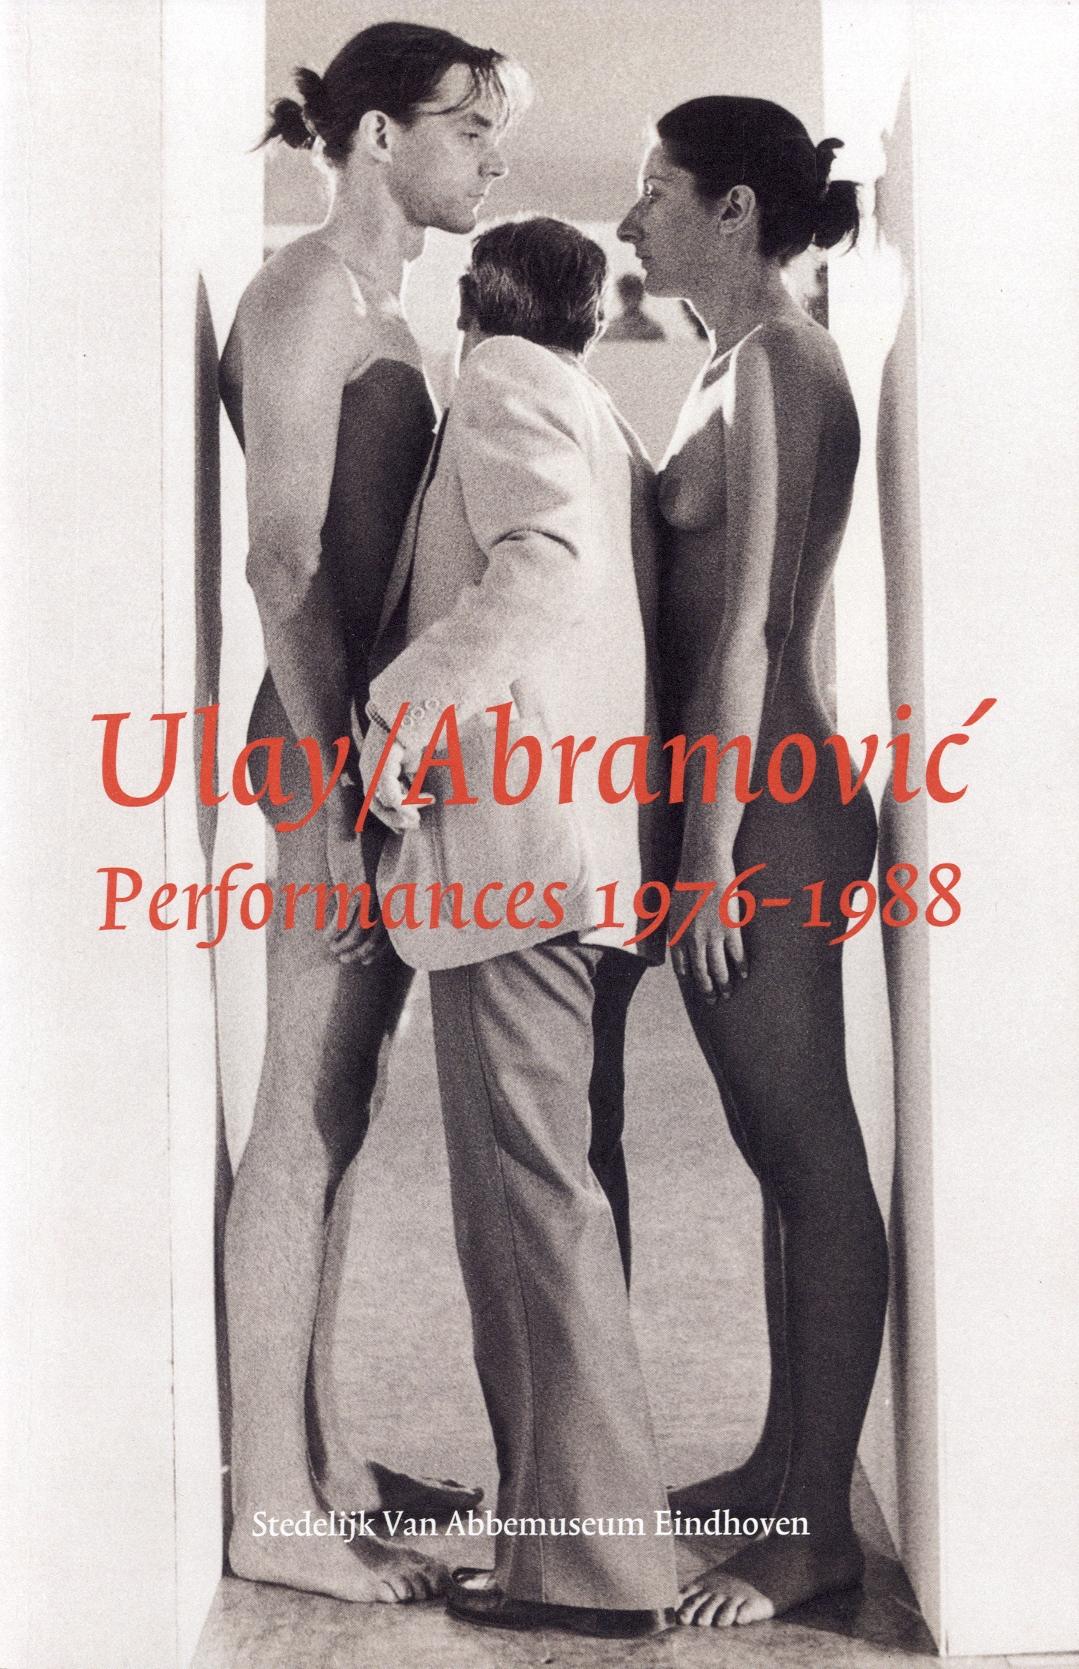 Ulay / Abramovic : Performances 1976-1988